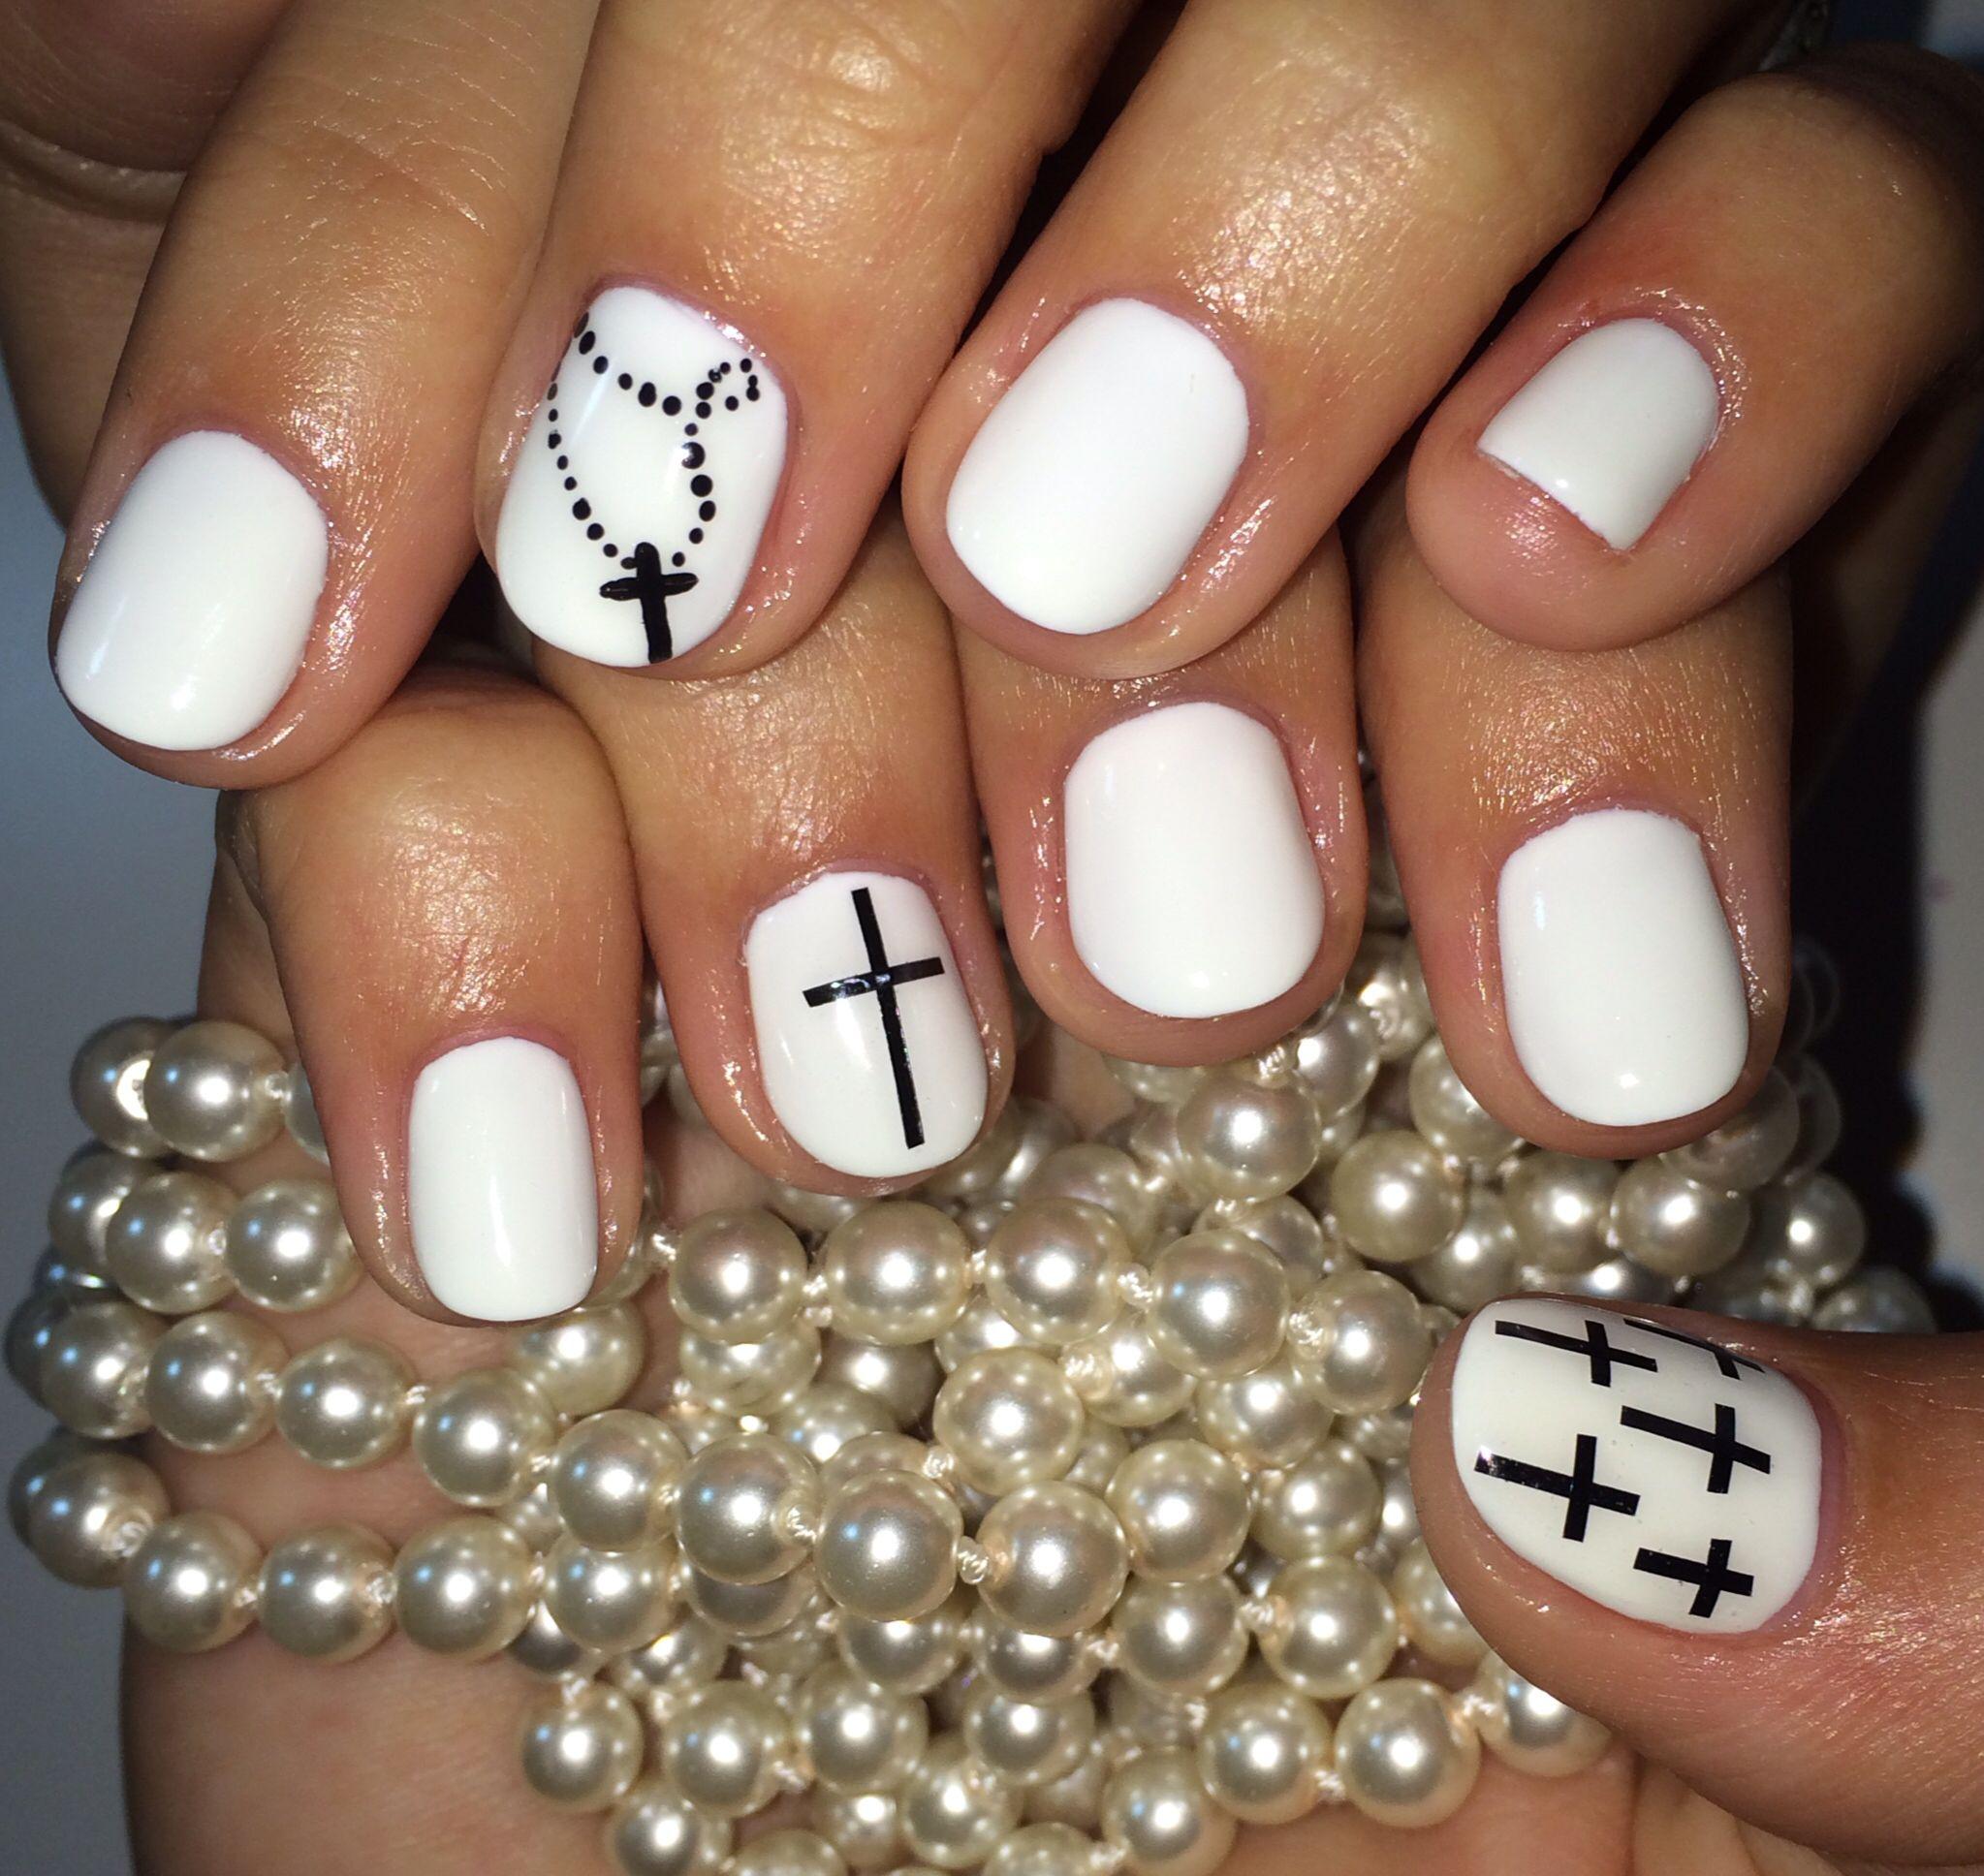 White mani with black cross nail art spring summer 2014 design white mani with black cross nail art spring summer 2014 design bymargarita prinsesfo Gallery